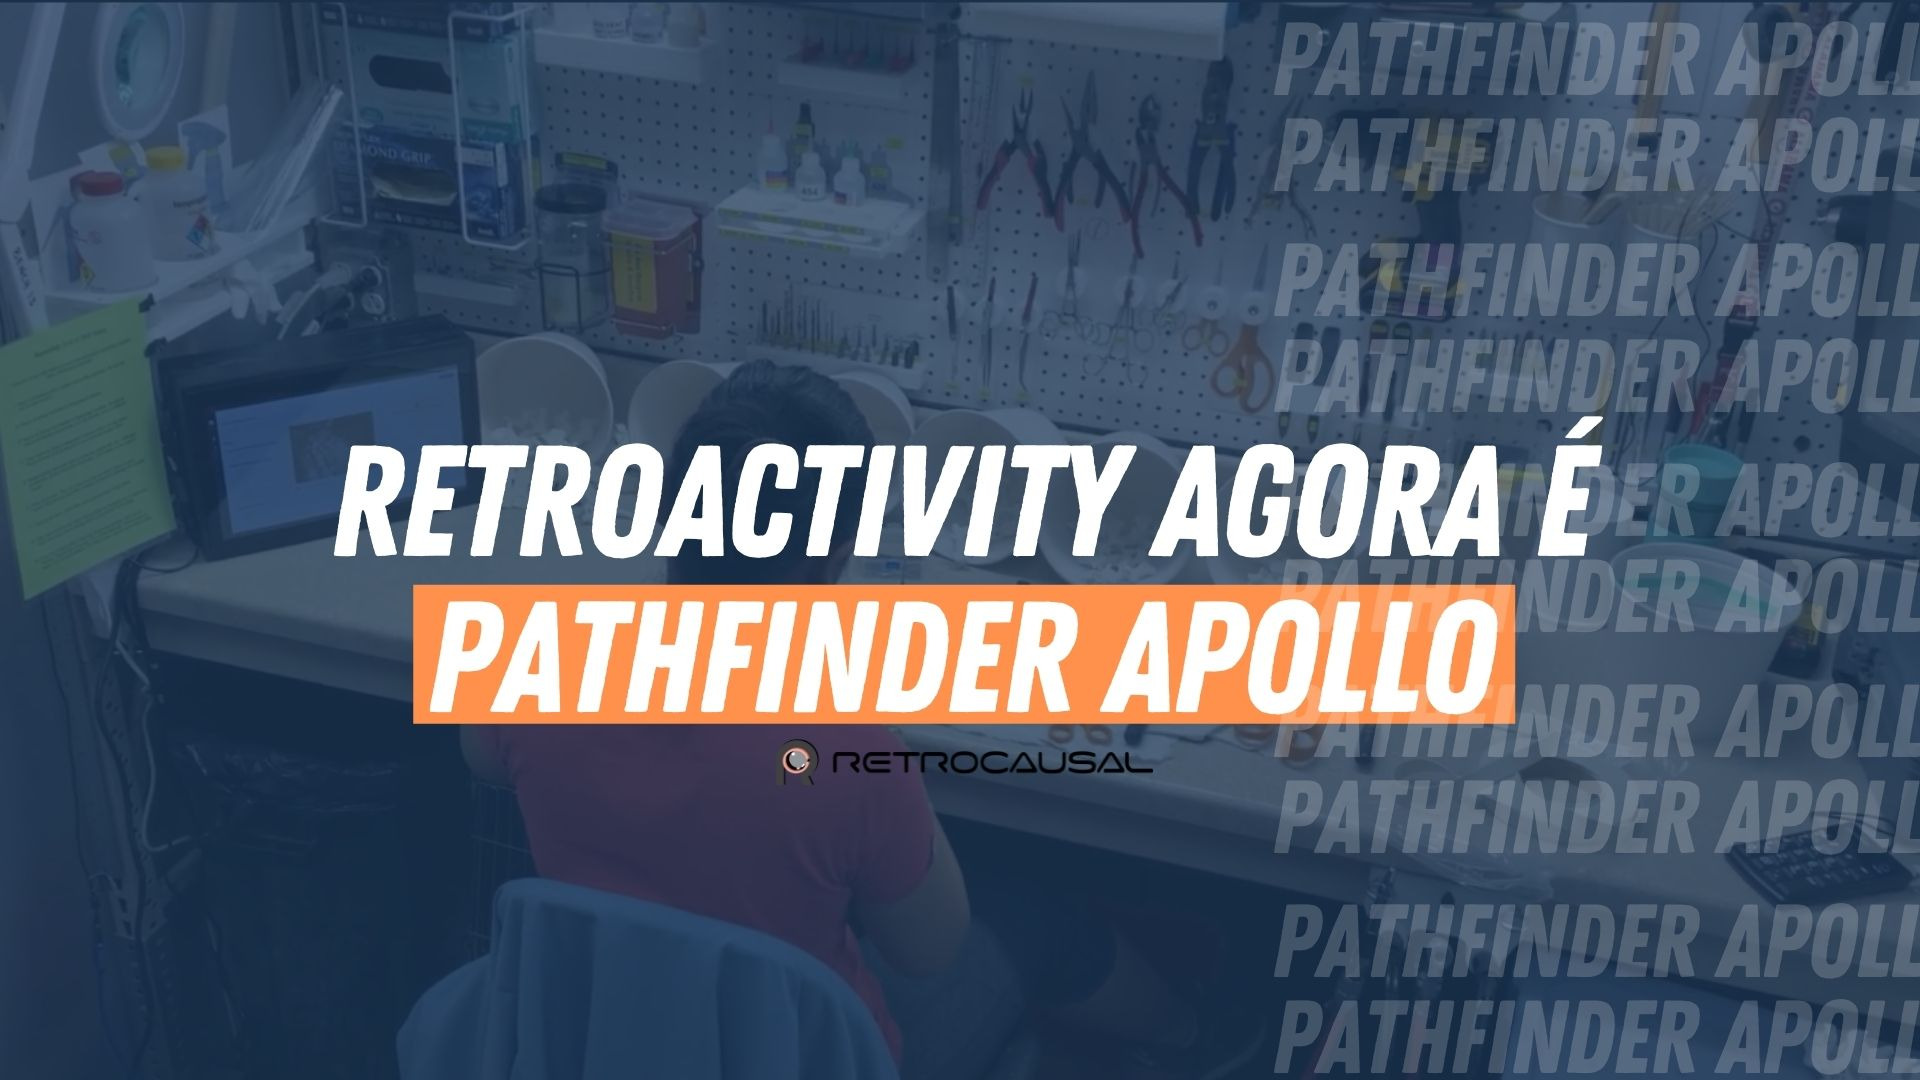 You are currently viewing Agora Retroactivity é Pathfinder Apollo.